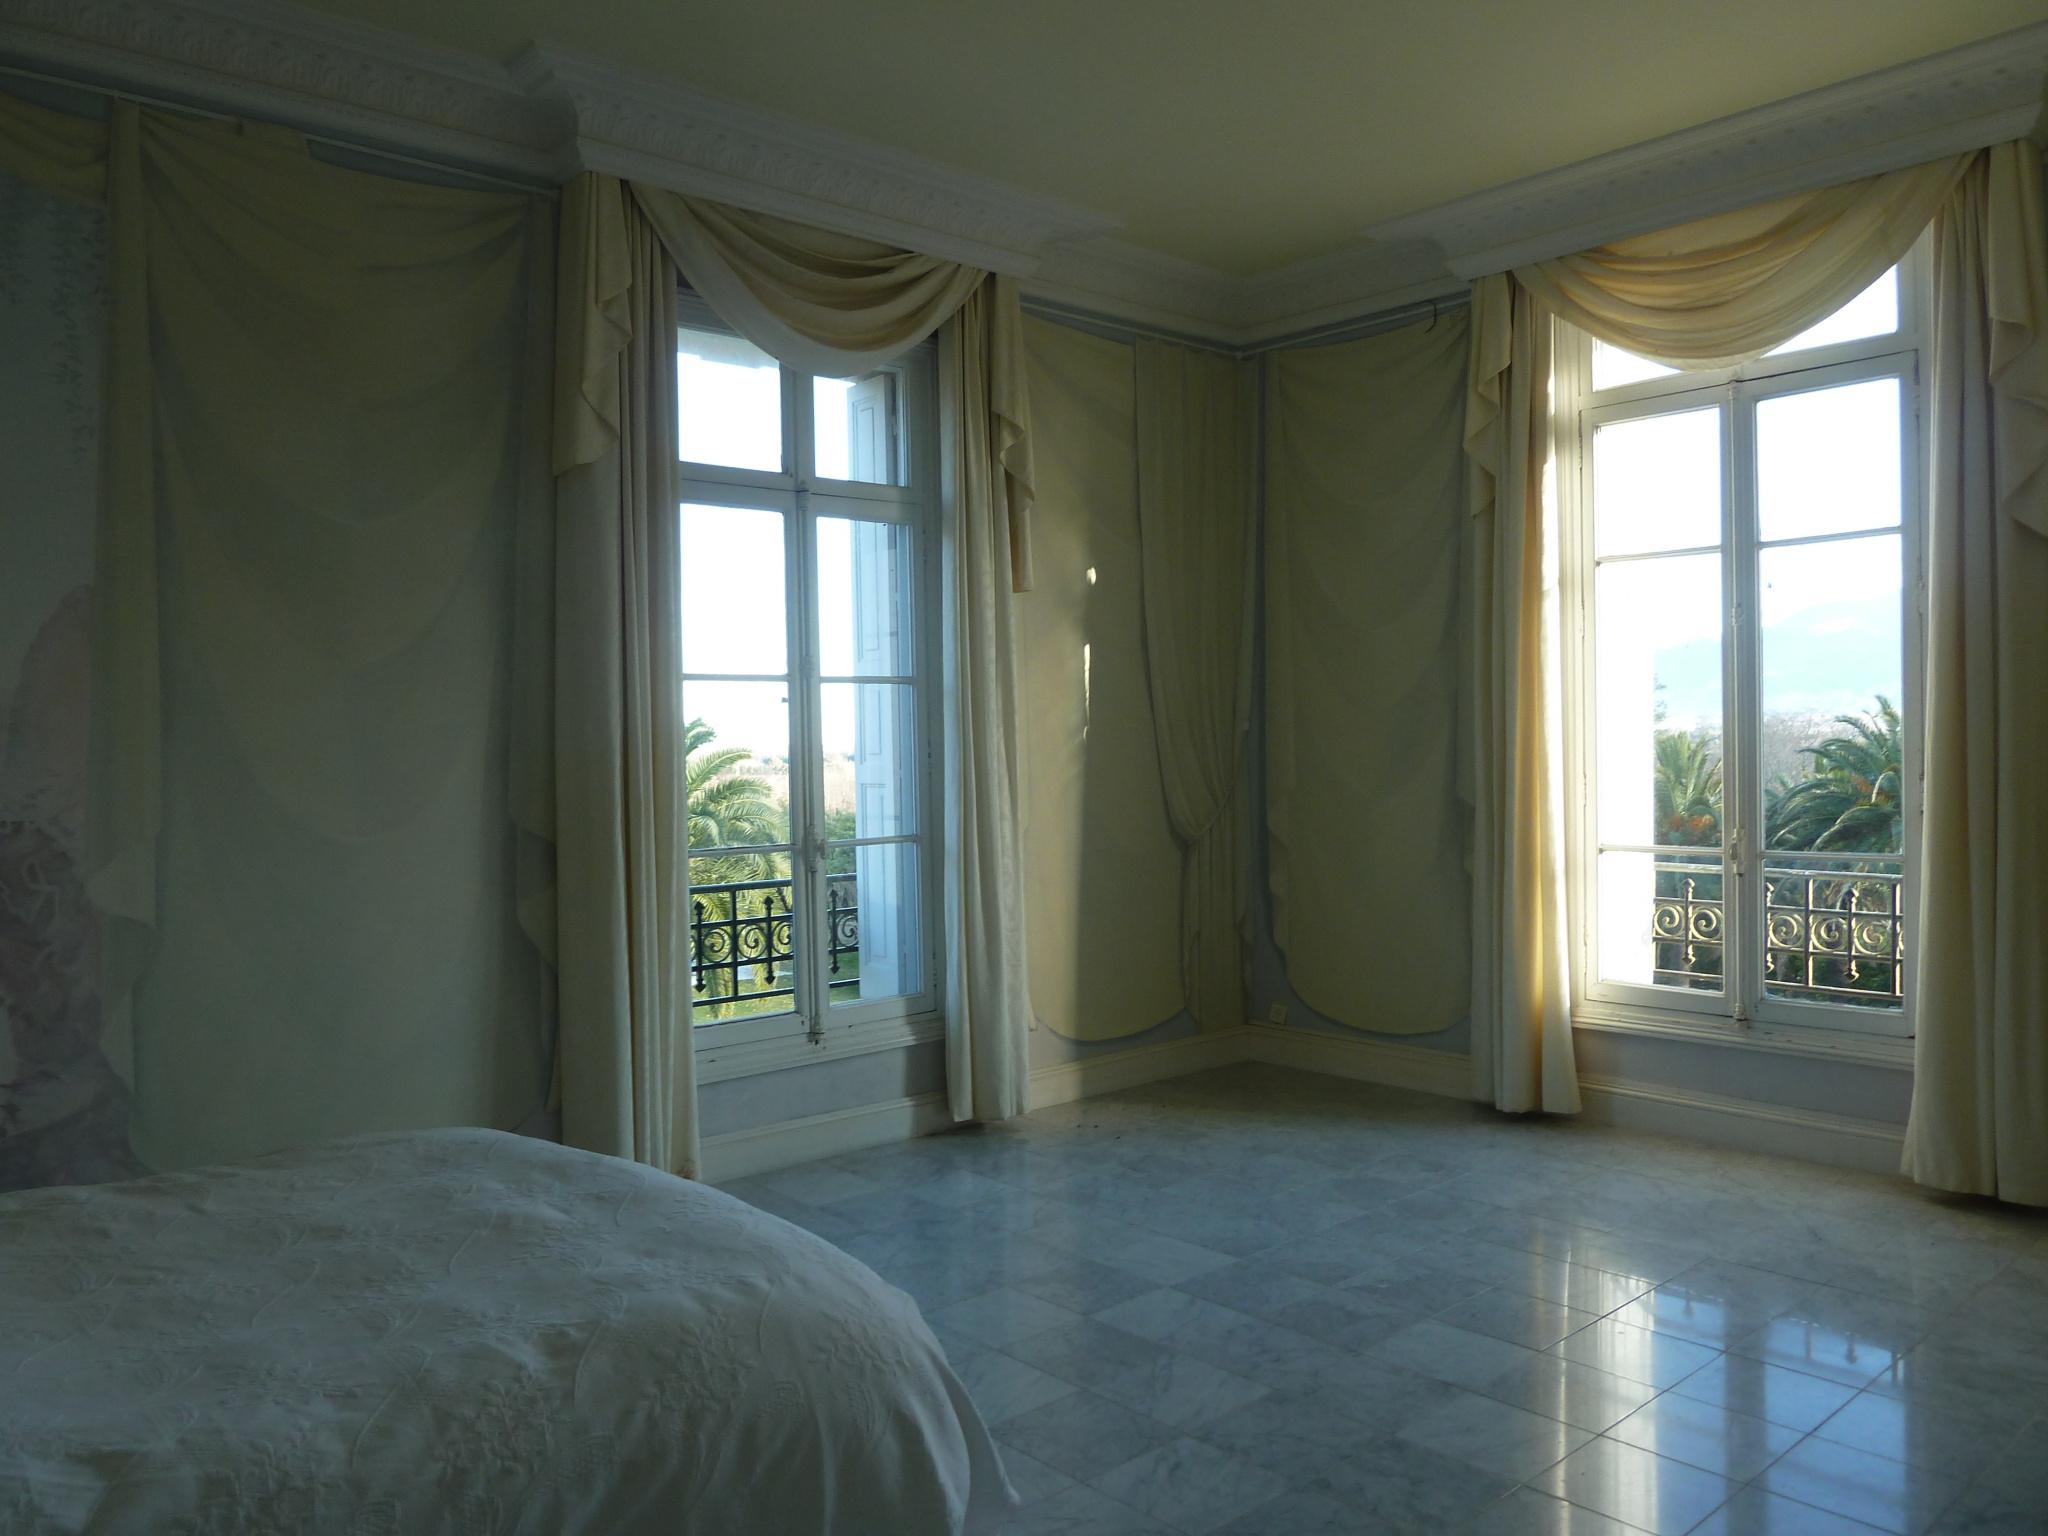 À vendre chateau de 760m2 à brouilla (66620) - Photo 27'